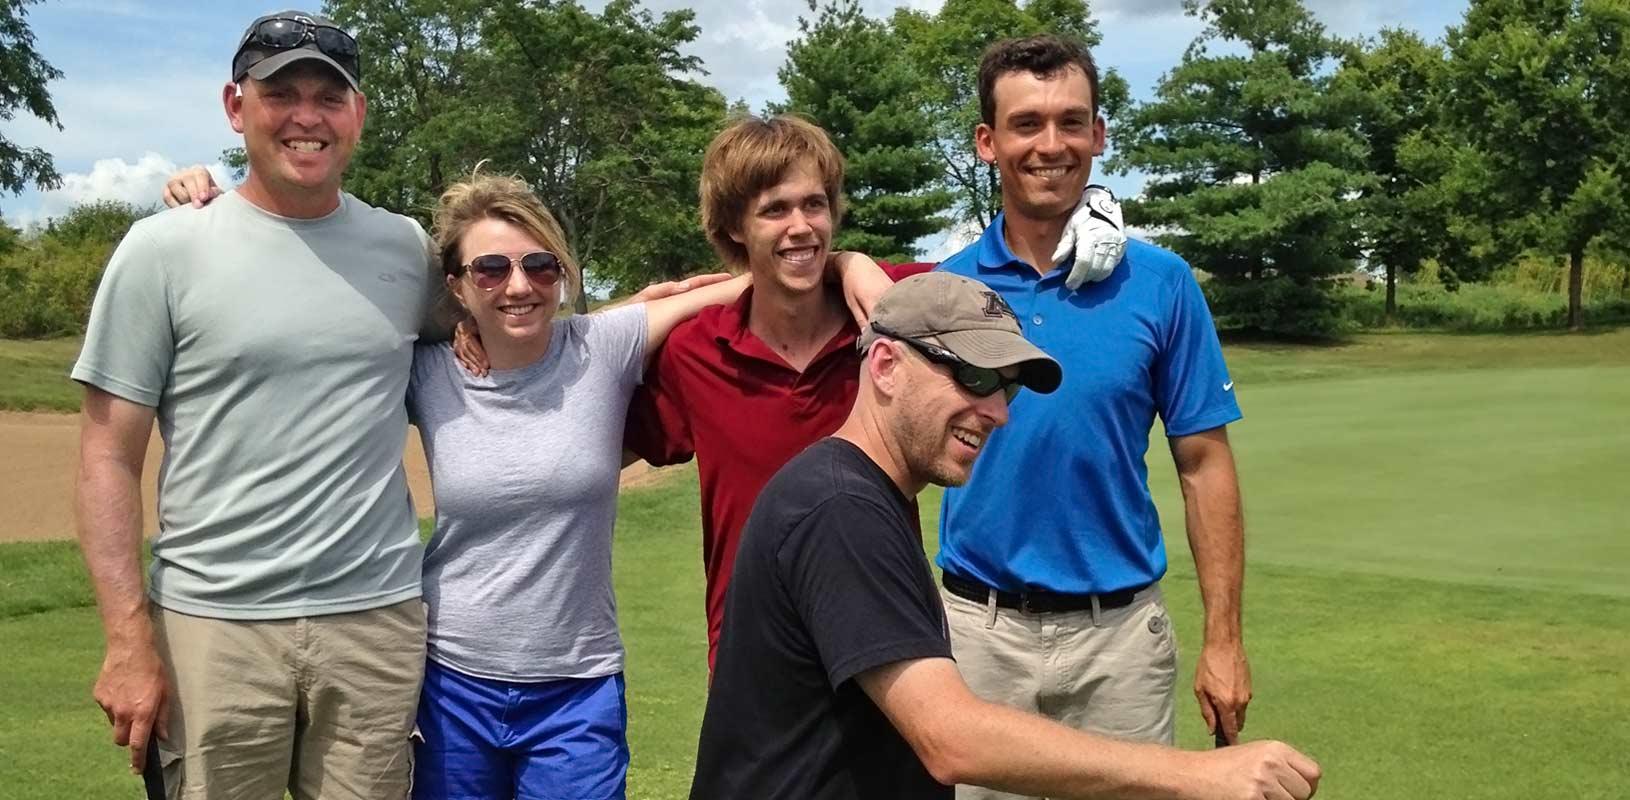 photo at TKDA golf event